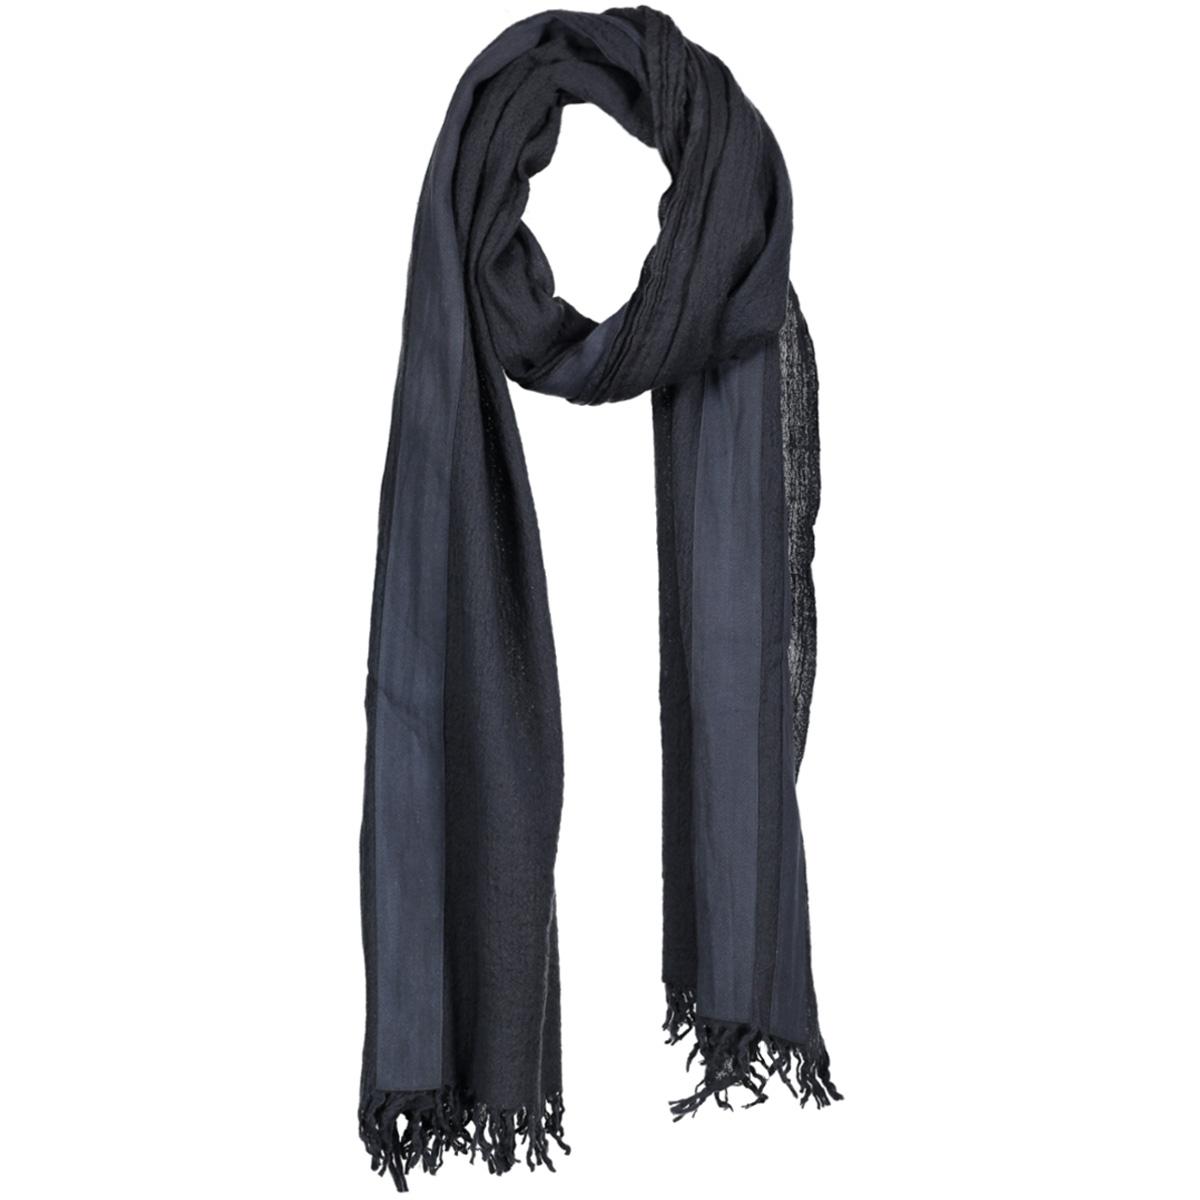 20-906-7103 10 days sjaal charcoal